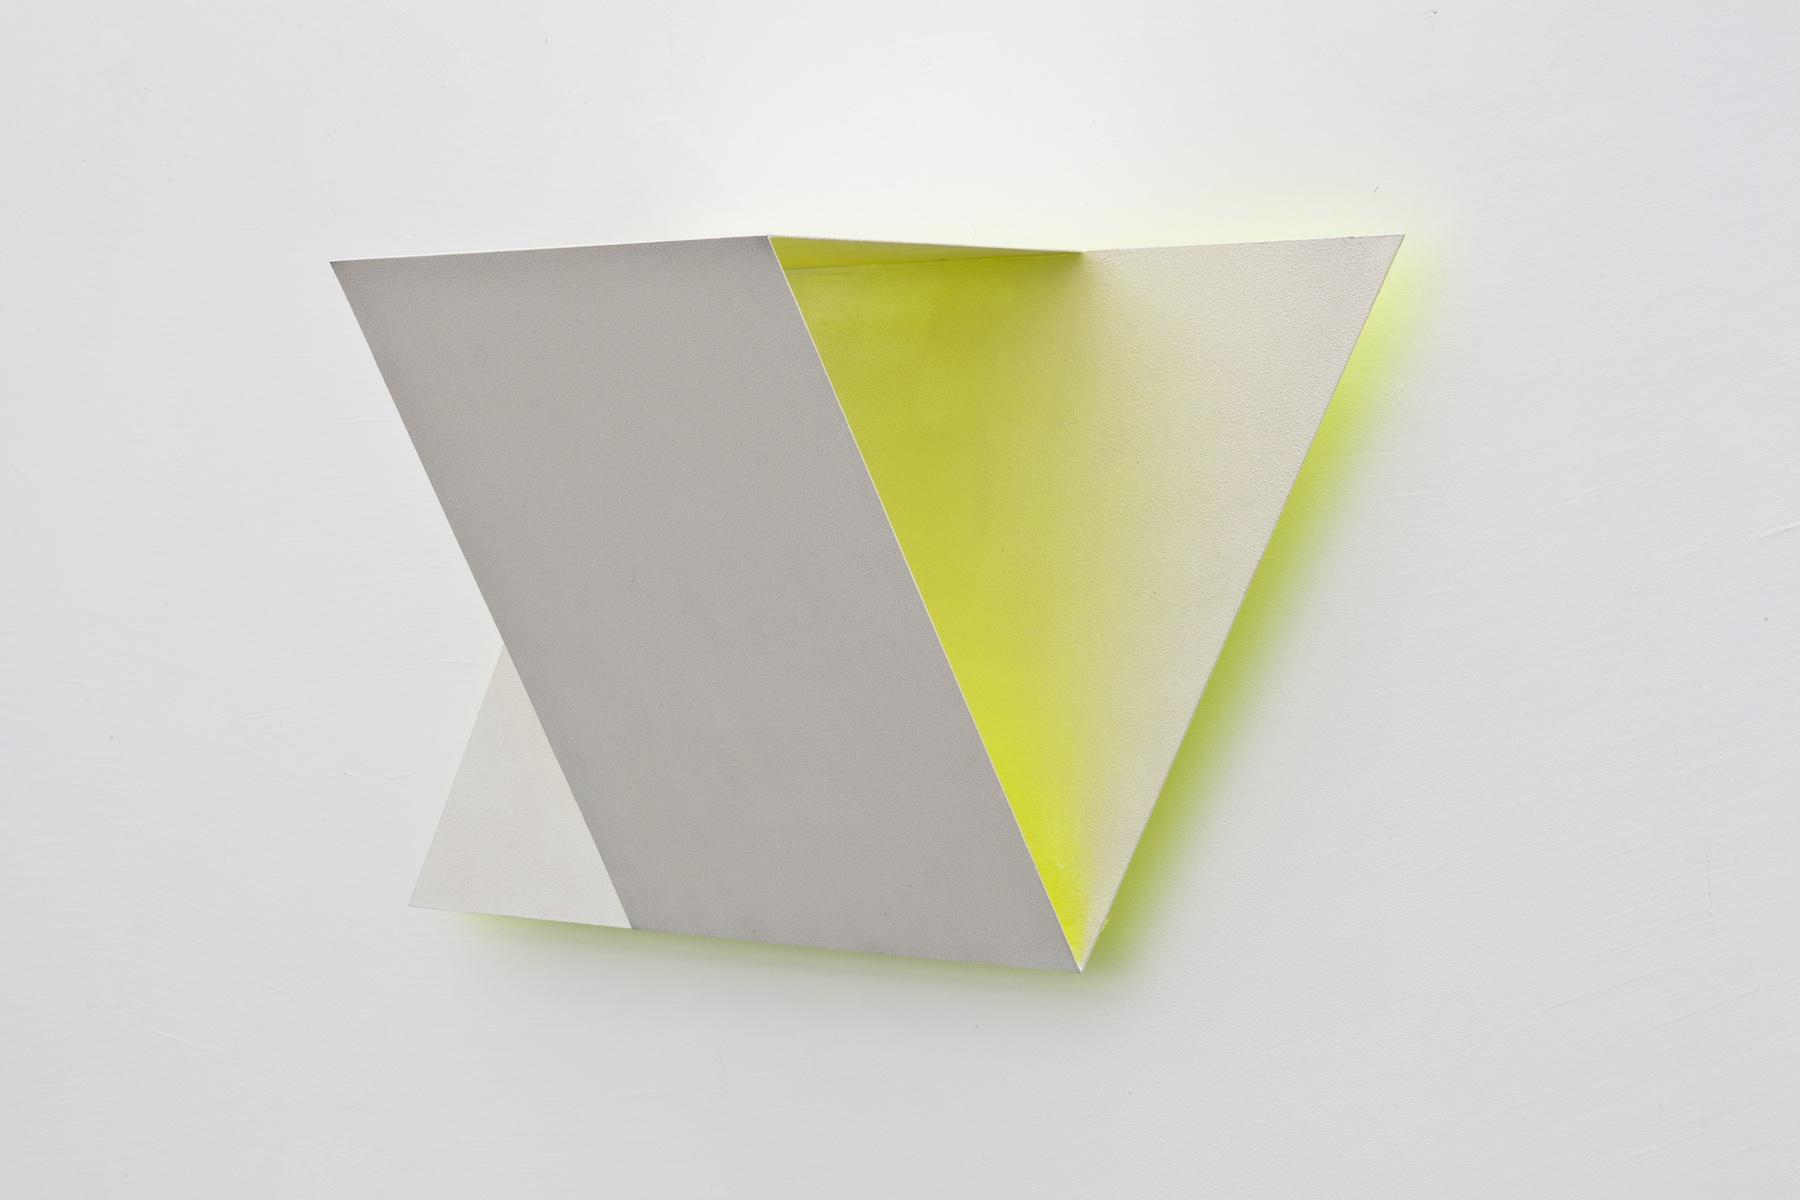 Xtra (Yellow), 2012, 55x26x18 cm